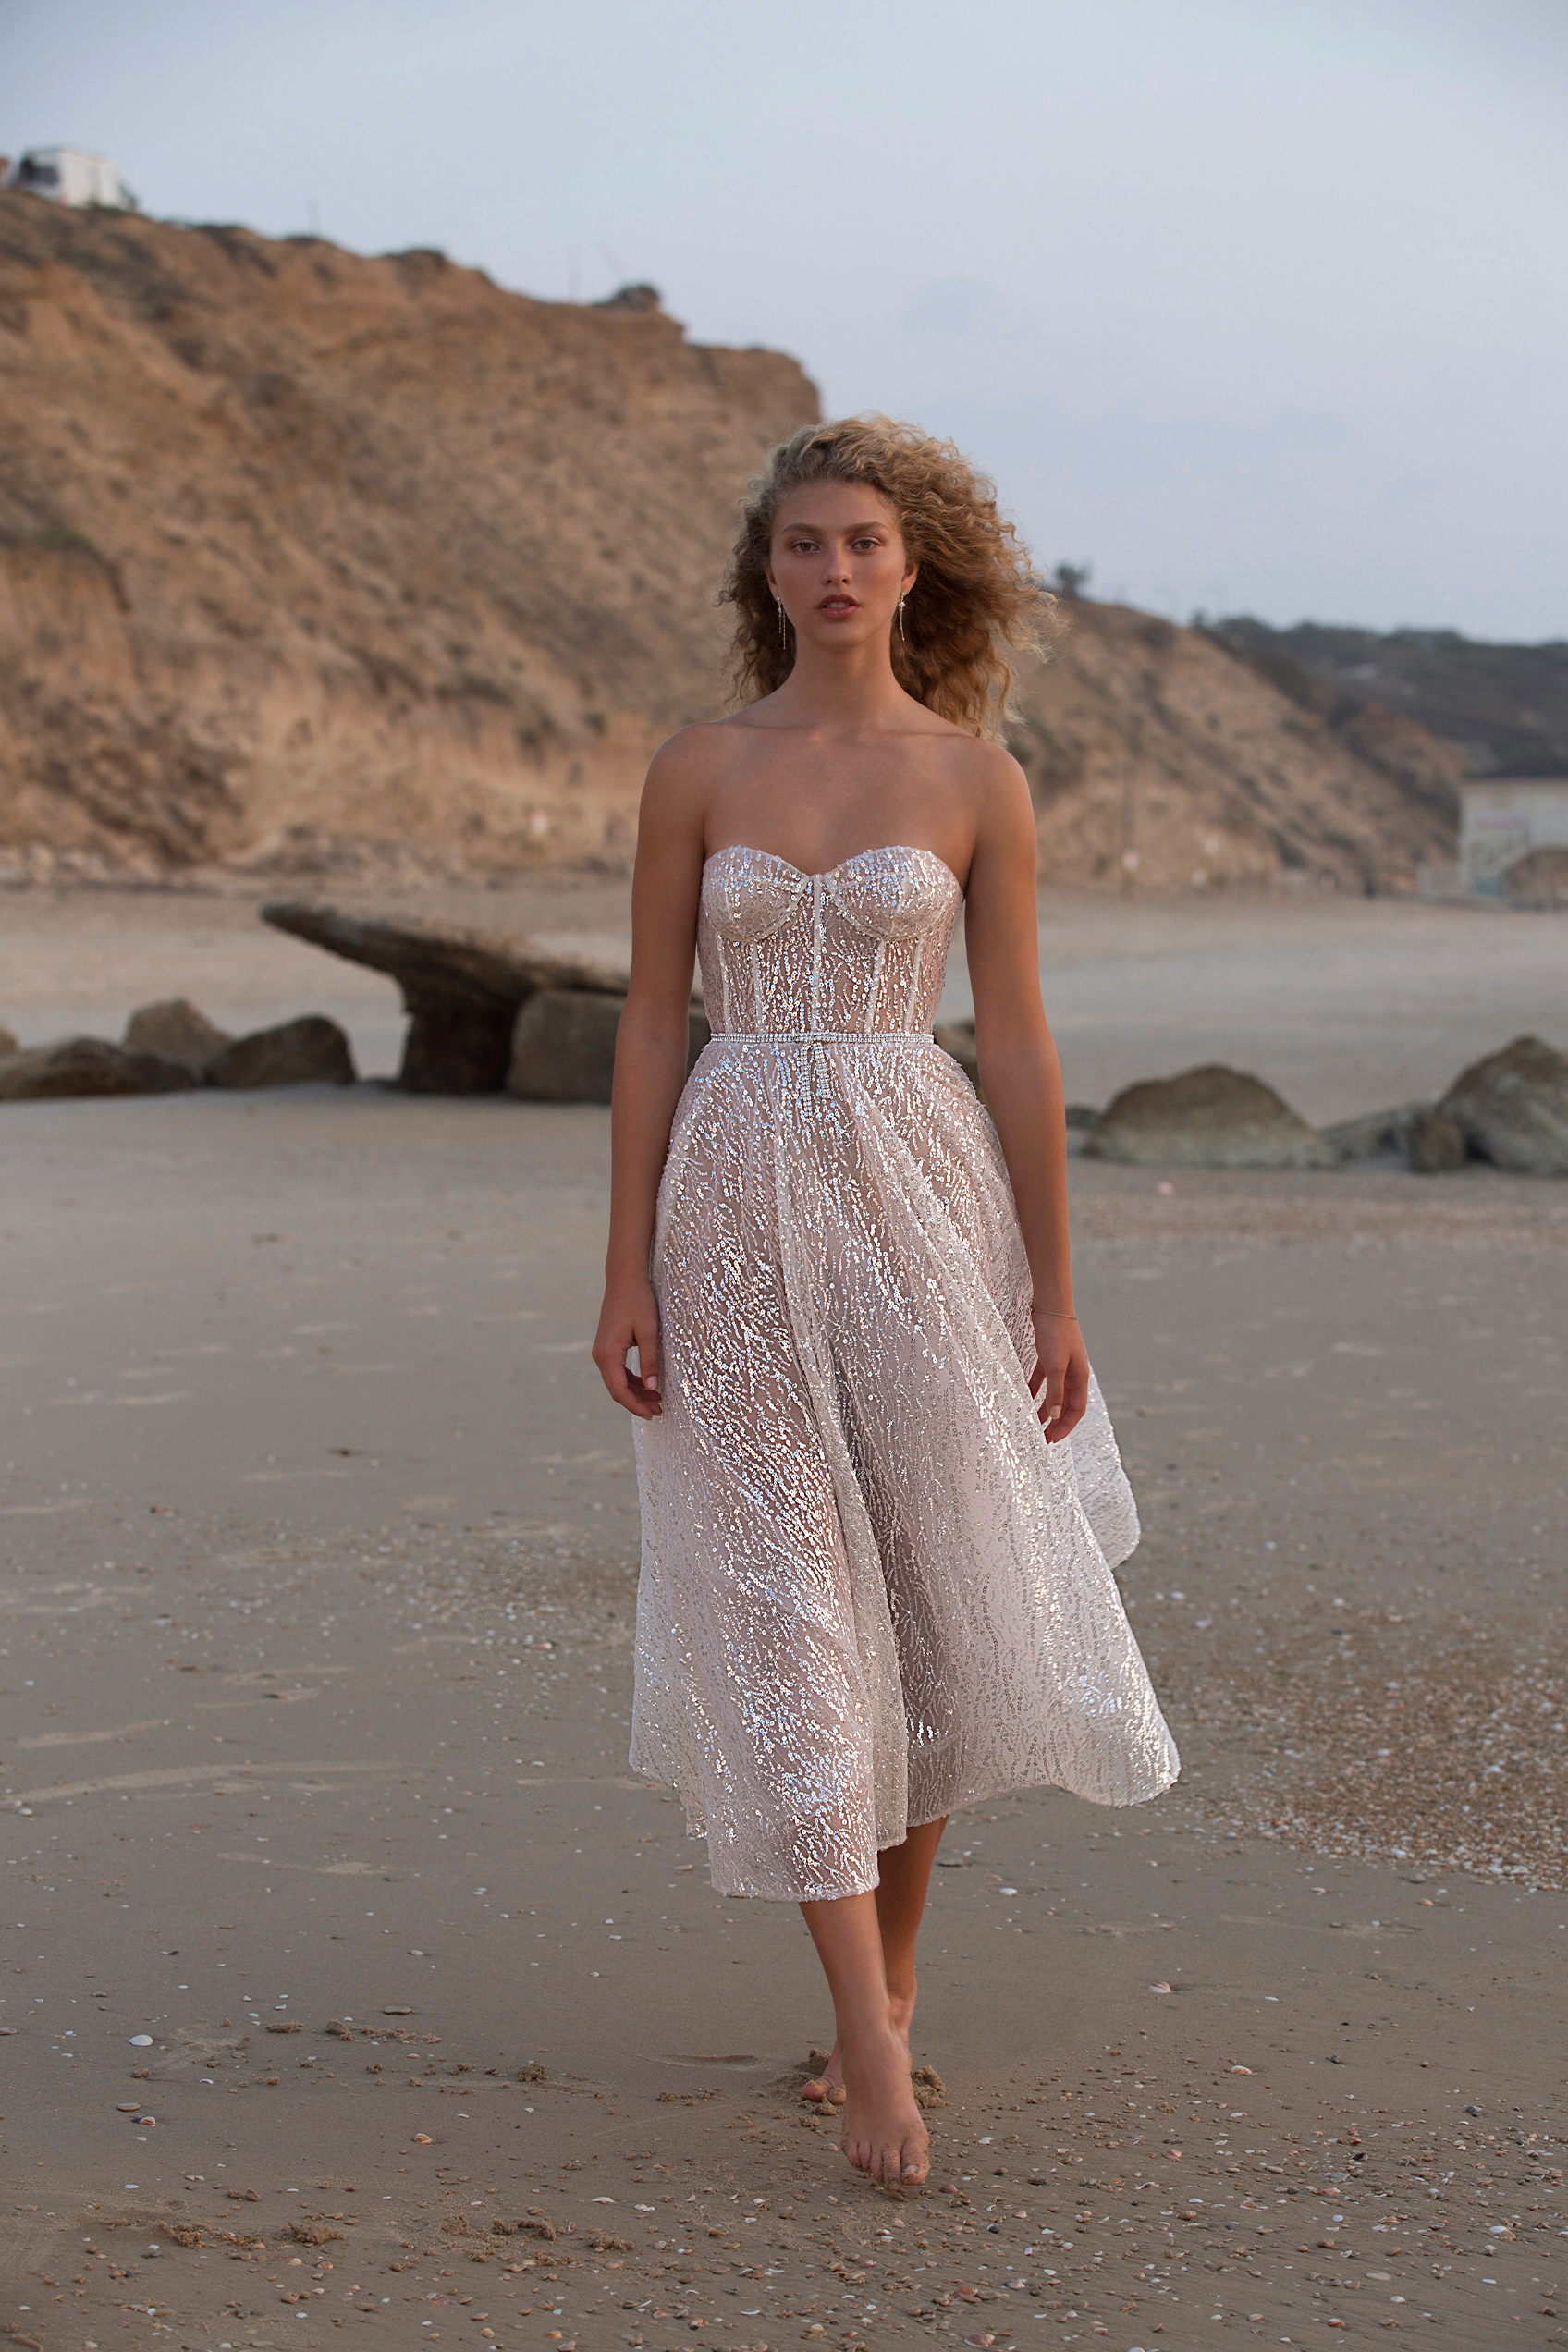 Veil Bridal Couture & Berta Bridal Fashion Event   20 June 2021 - Wedding Expos & Fairs Cape Town